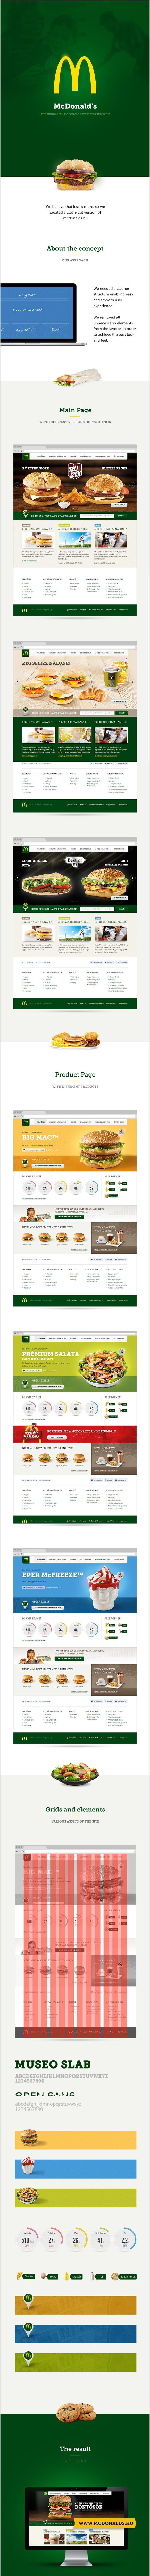 The hungarian McDonald's website's redesign http://www.behance.net/gallery/The-hungarian-McDonalds-websites-redesign/10576175